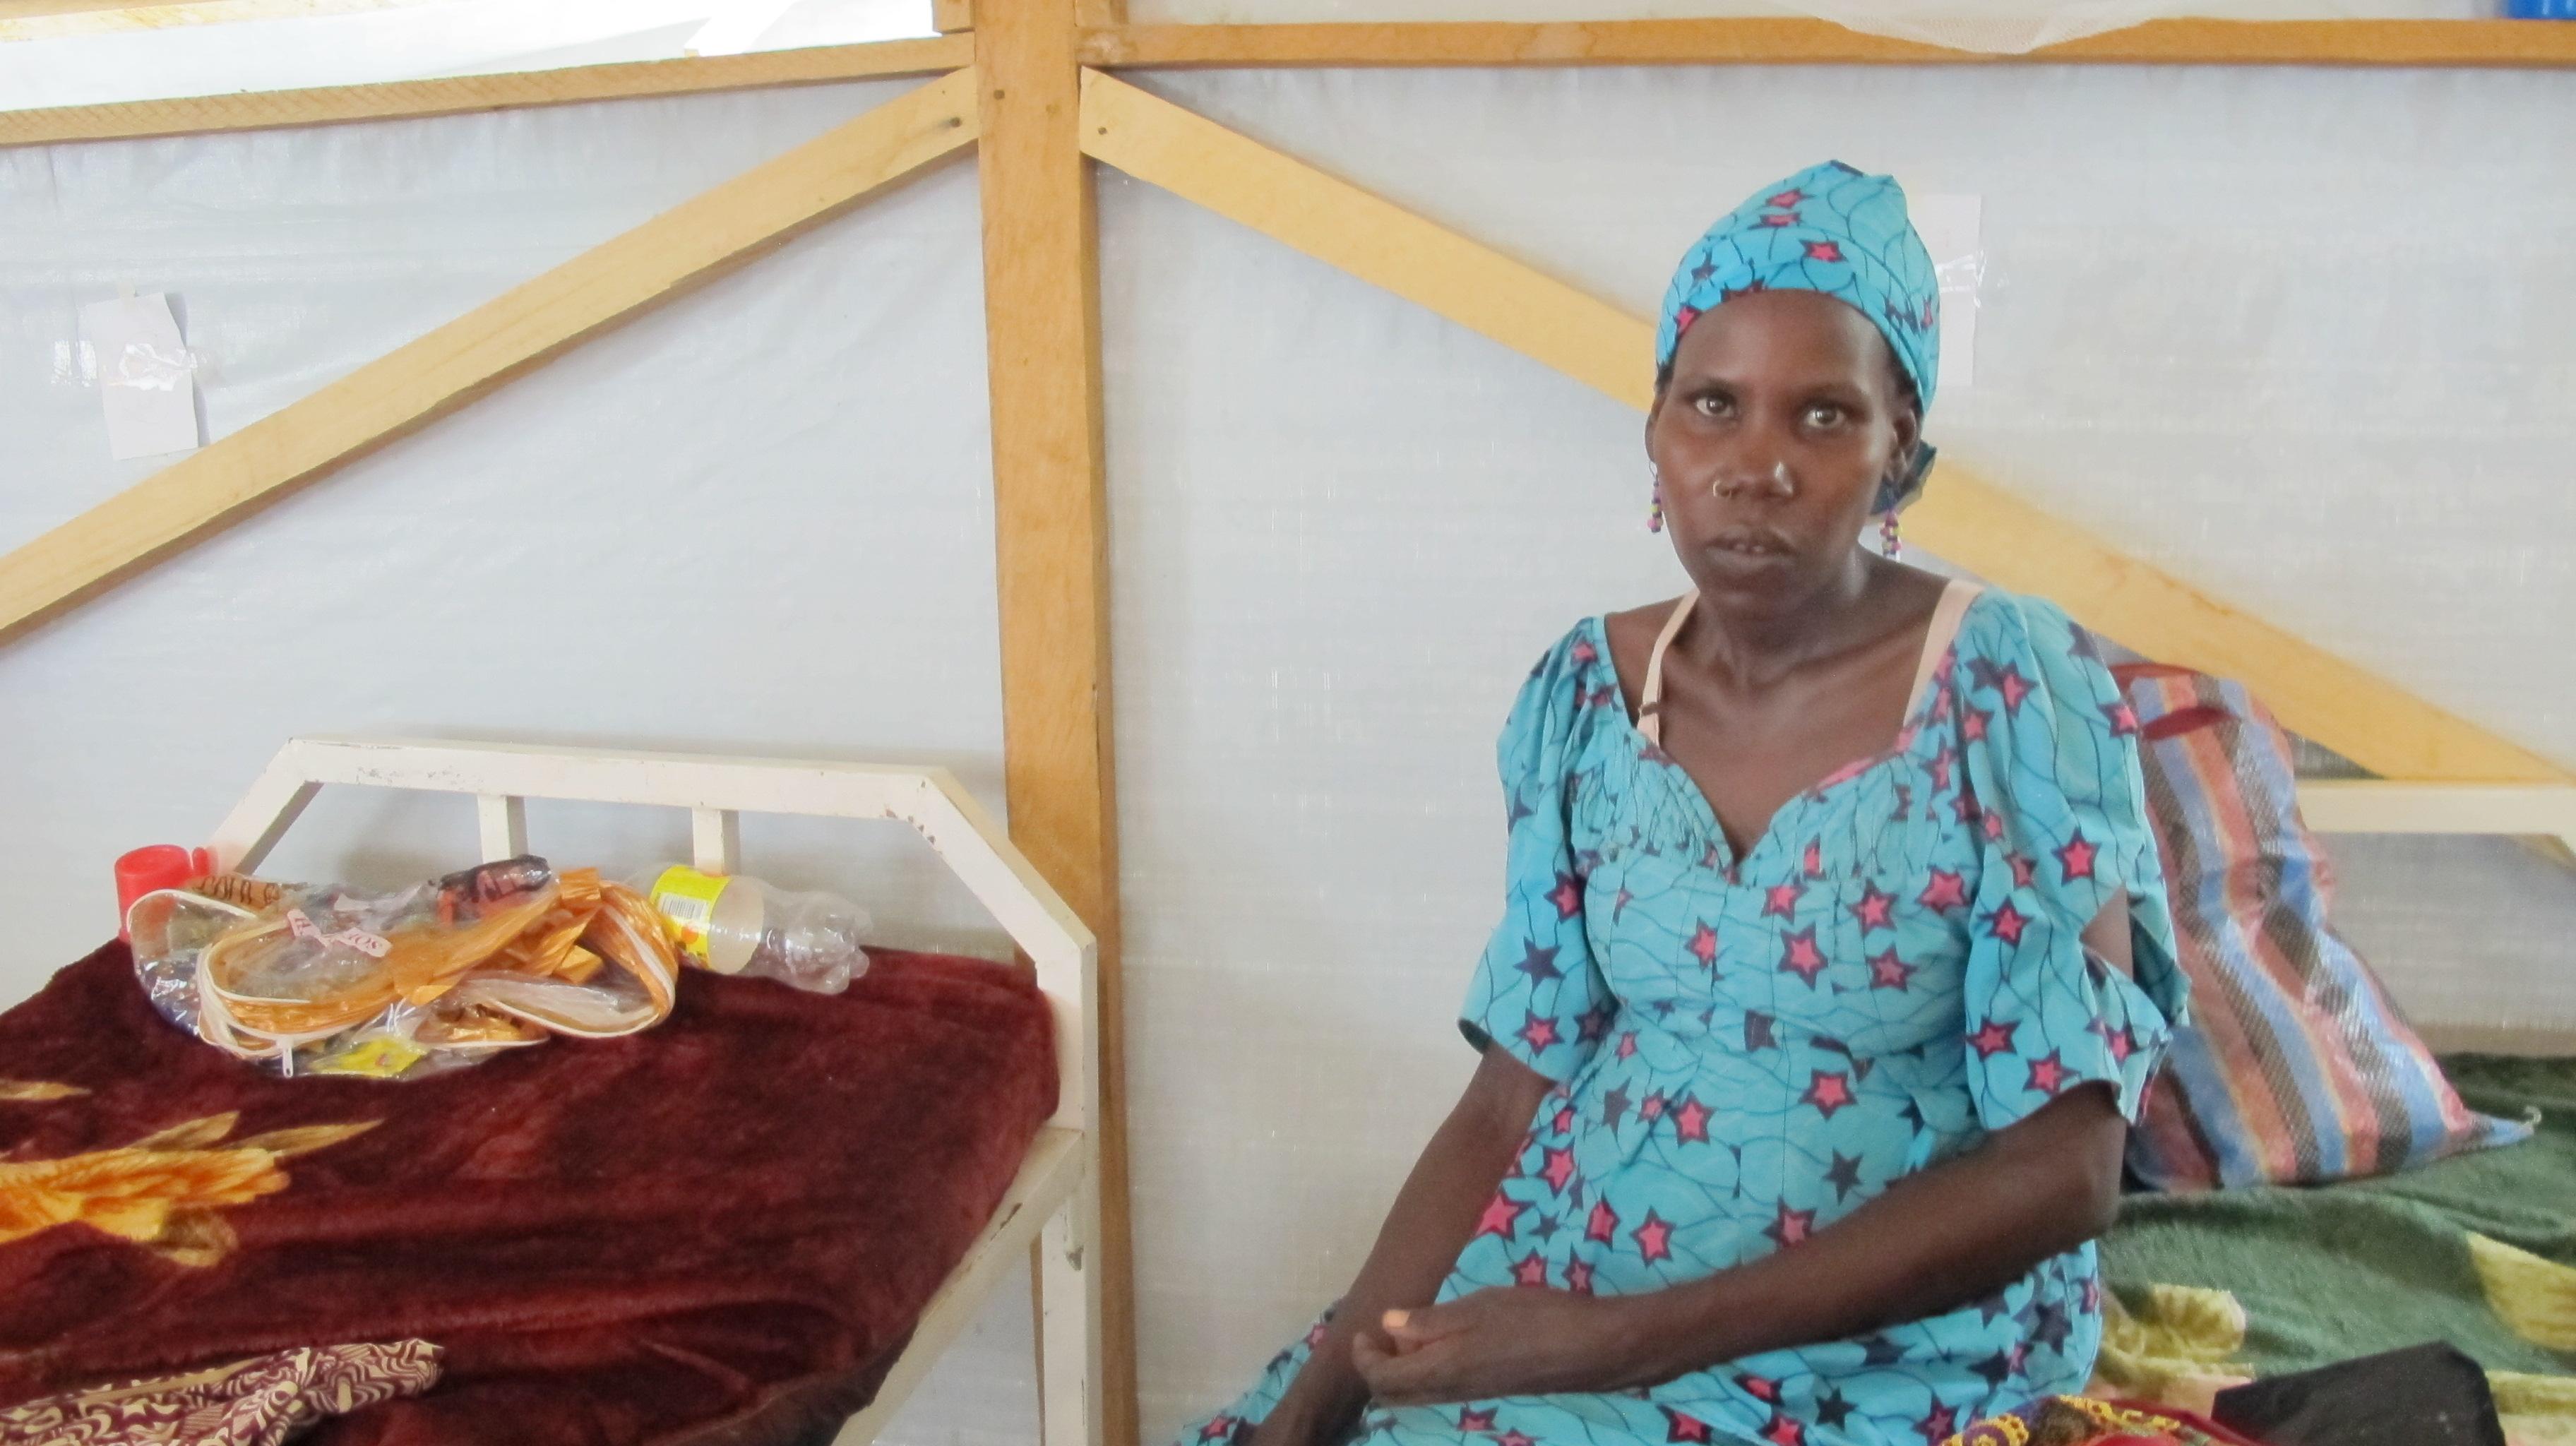 Testimony of a nigerian refugee